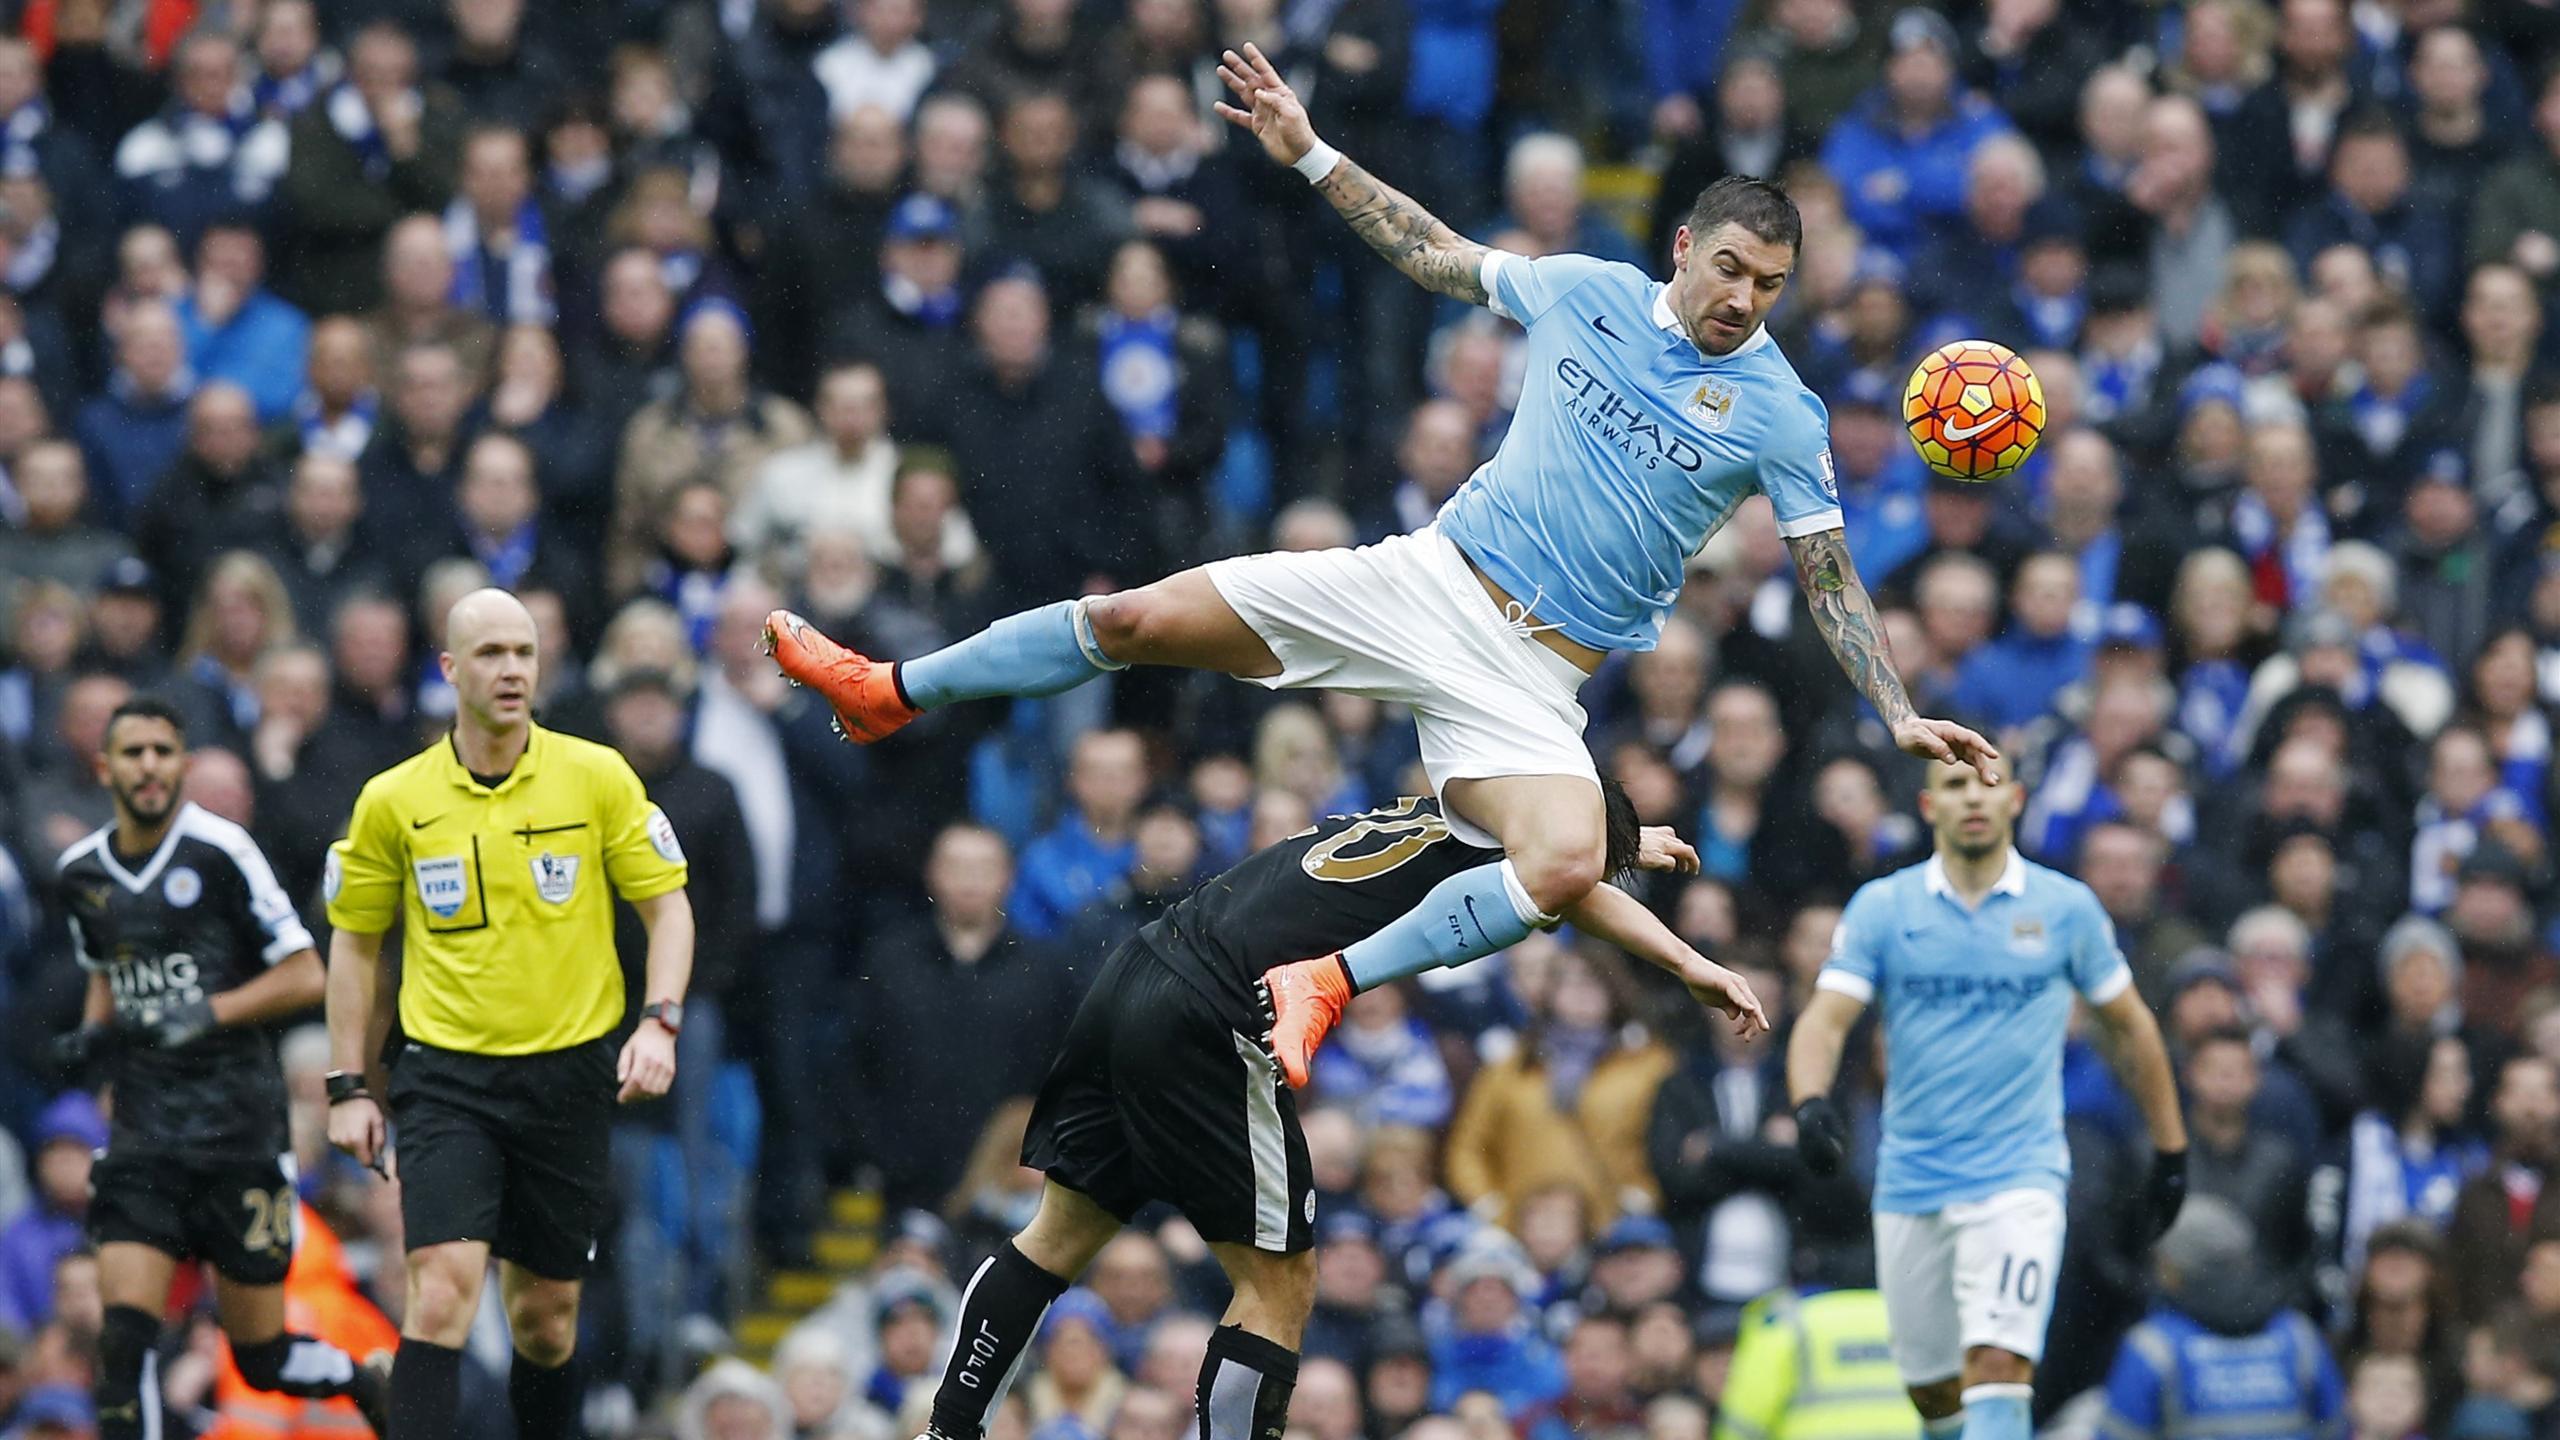 Aleksandar Kolarov takes a tumble against Leicester City